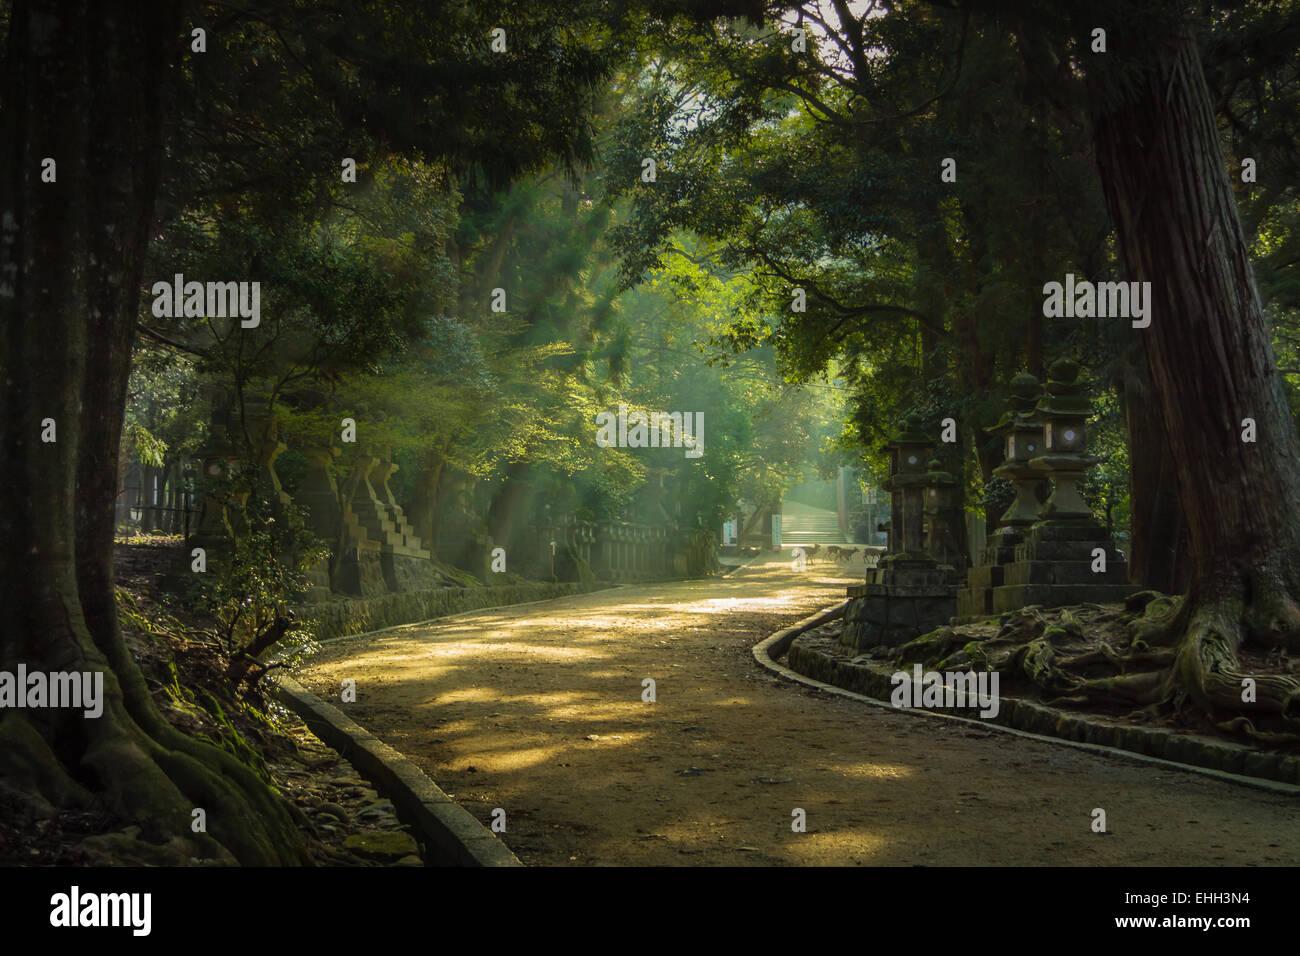 Spring morning sunshine illuminates the forest path to Kasuga Grand Shrine, Nara, Japan. Deer cross the path in - Stock Image